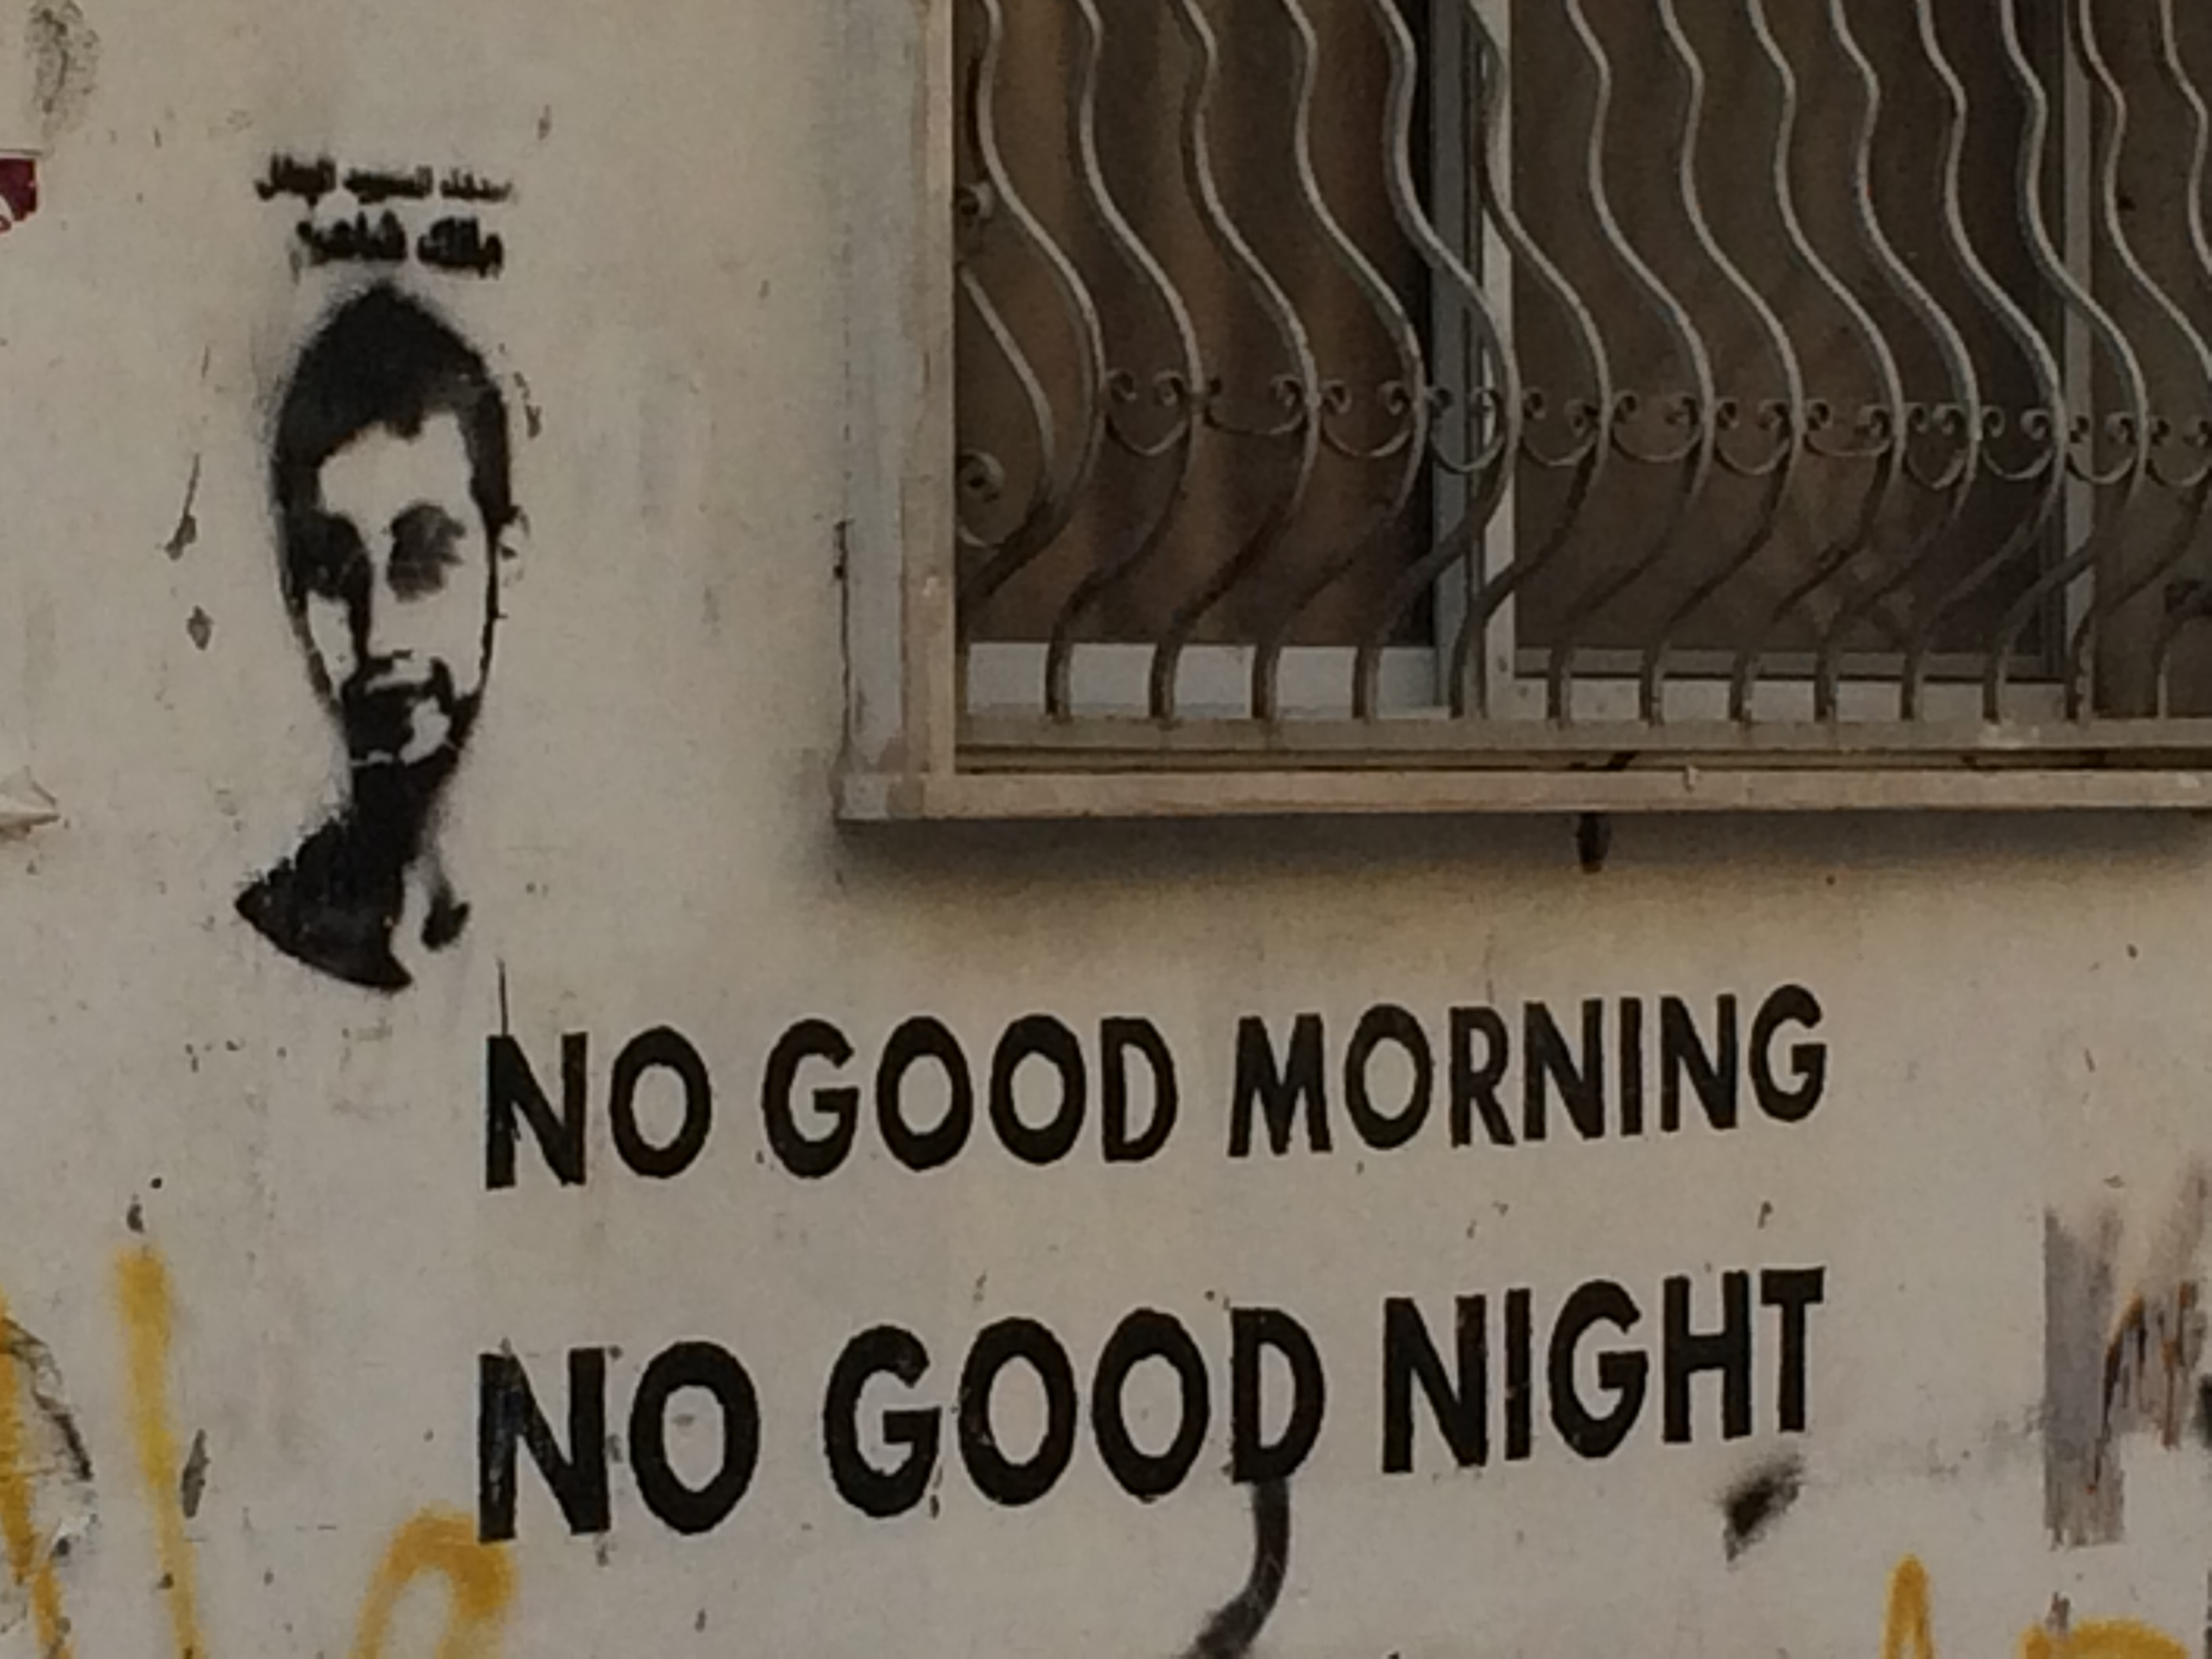 """No good morning, no good night"" written on graffiti wall in Palestine"